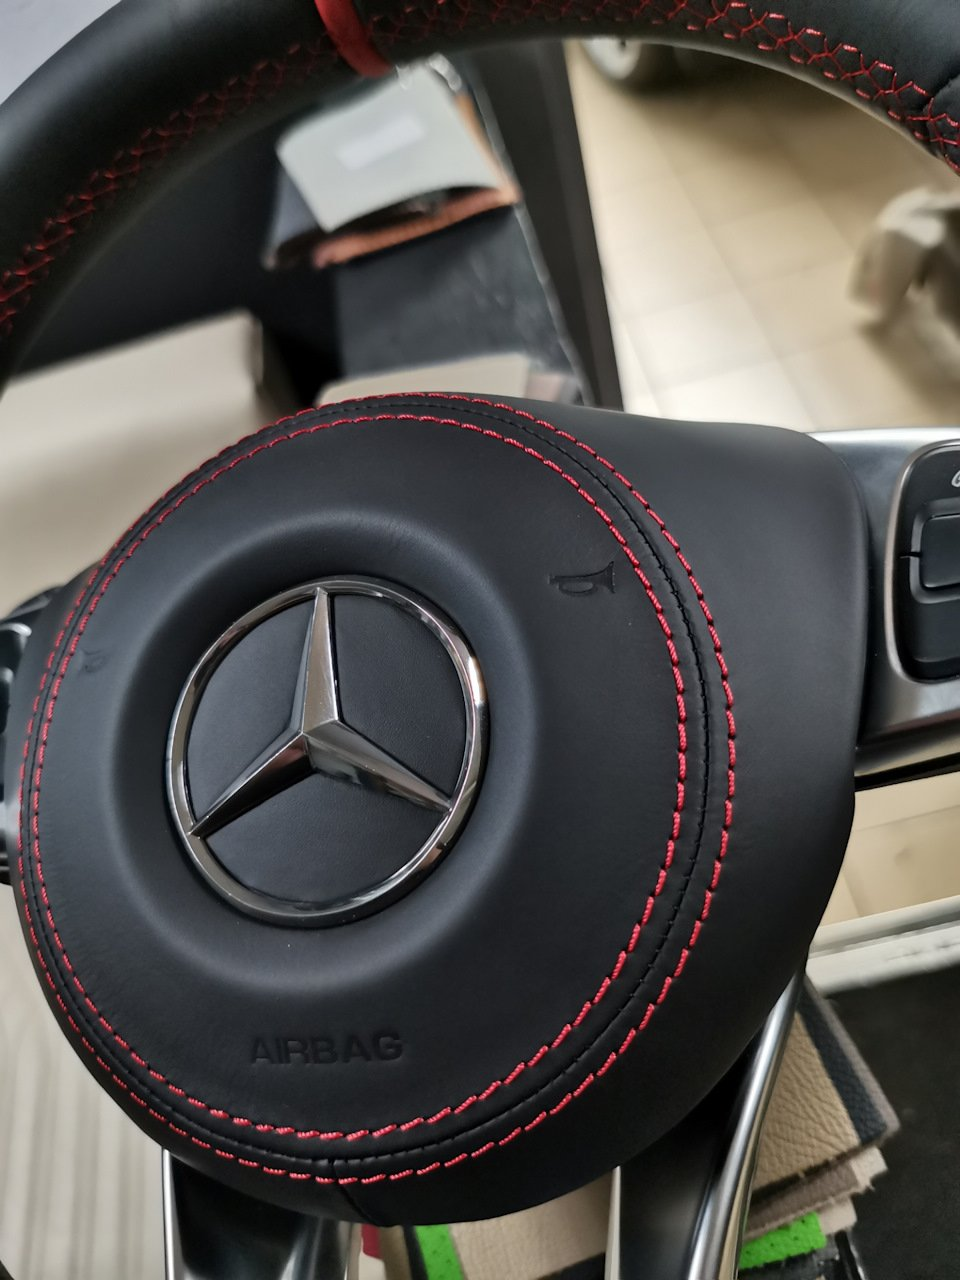 Mercedes M-class ONE.6.3 AMG 5.5 Kompressor W163 (39)